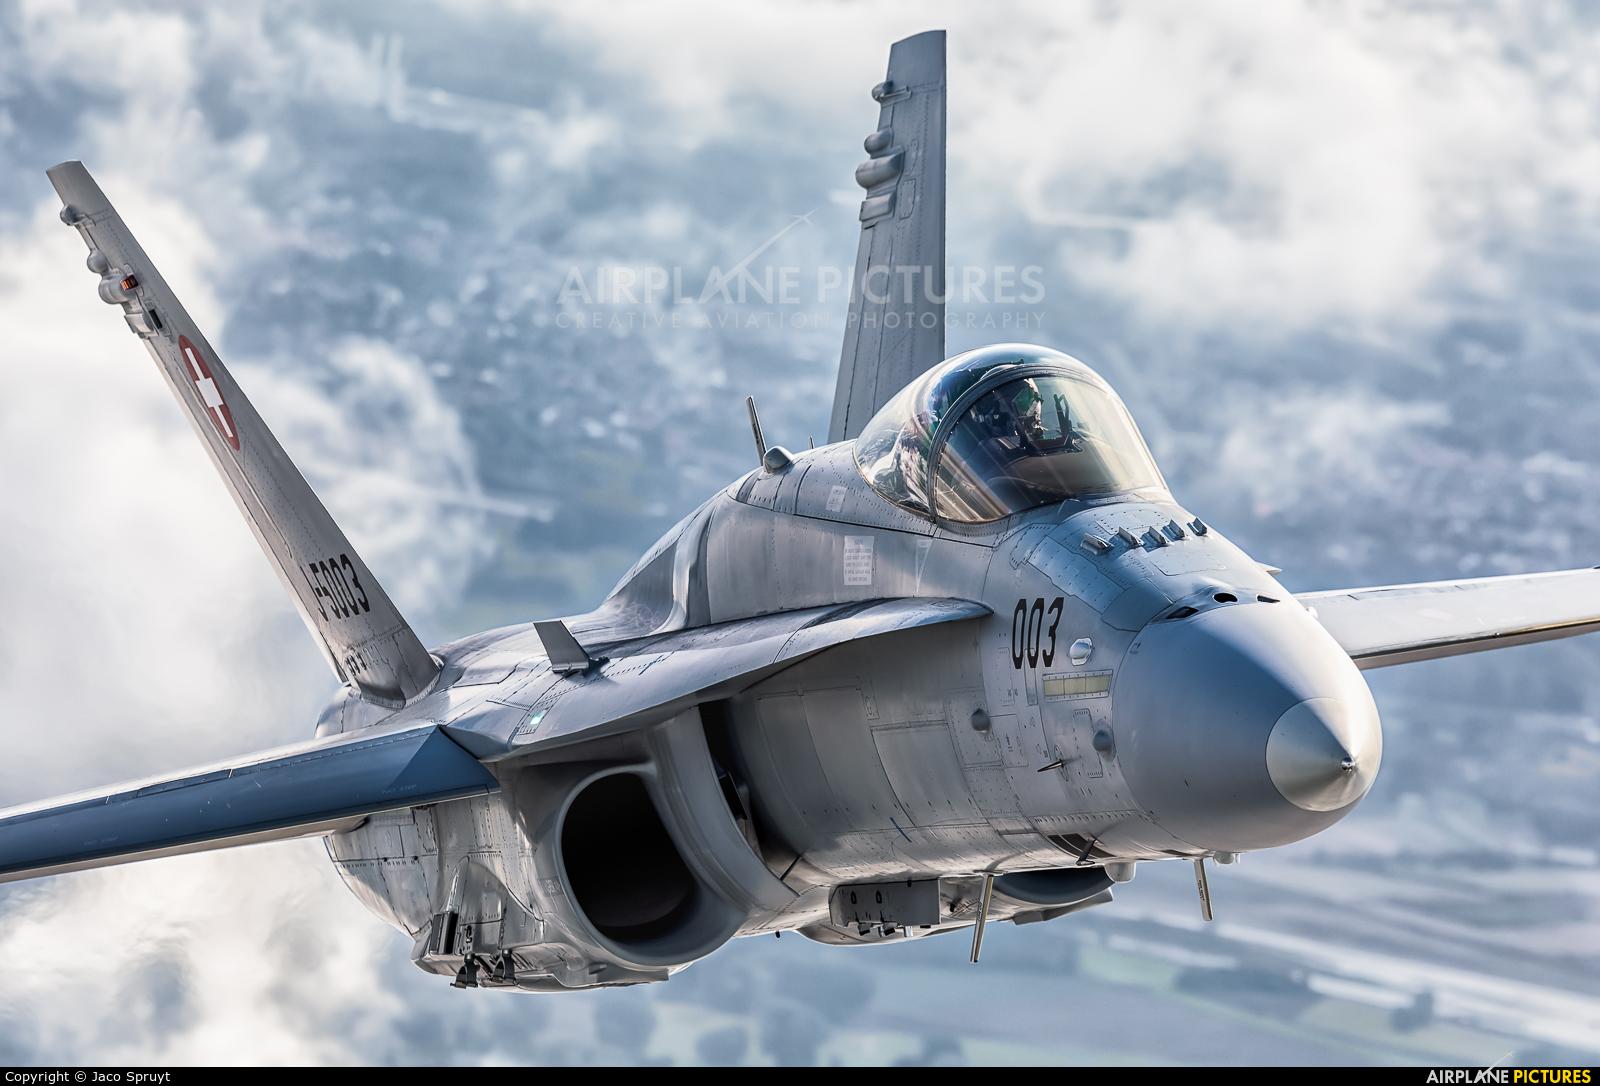 Switzerland - Air Force J-5003 aircraft at In Flight - Belgium